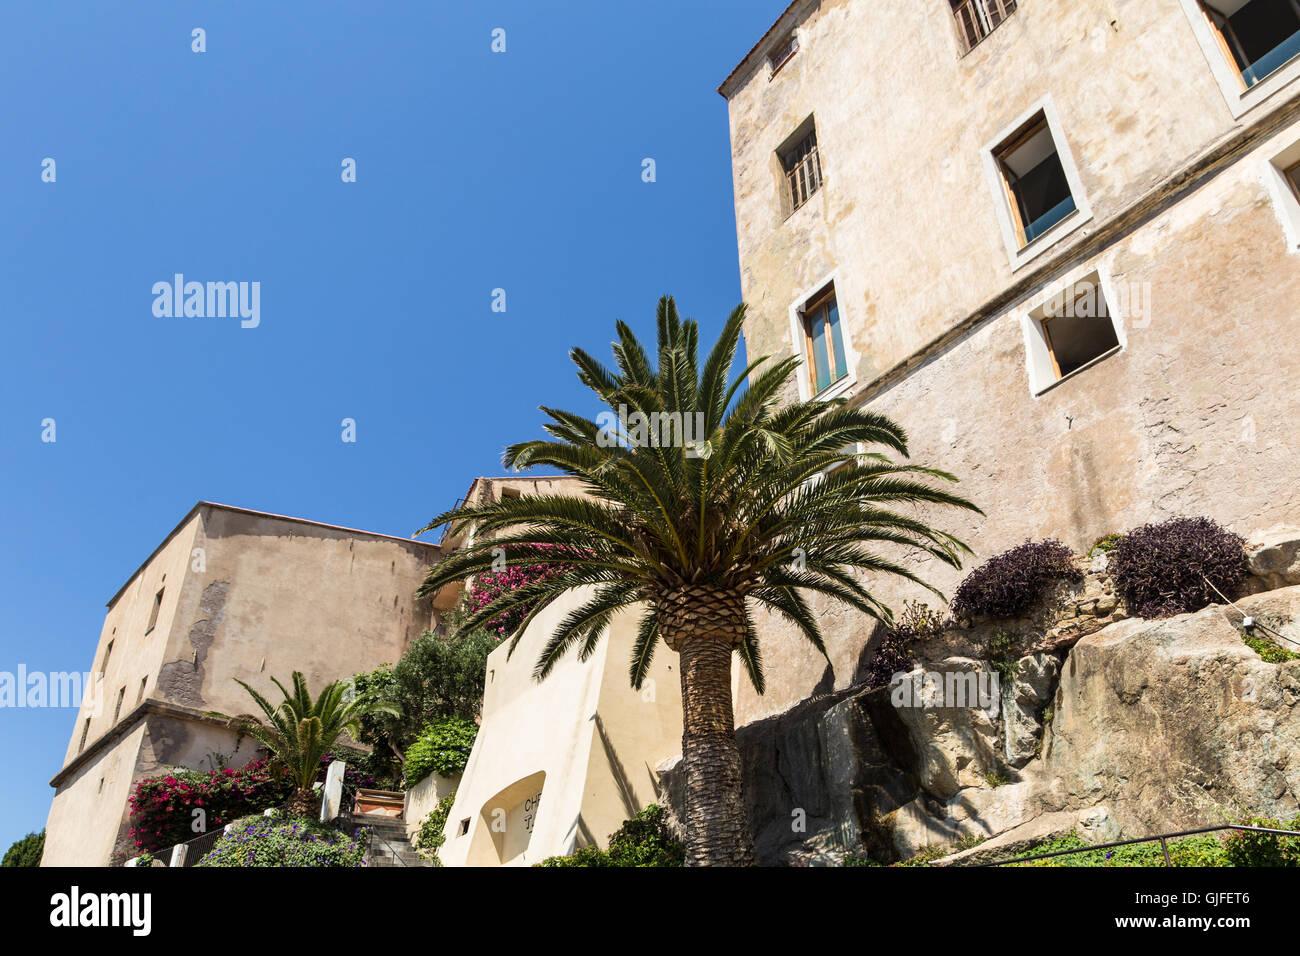 Calvi citadel in the French island of Corsica - Stock Image